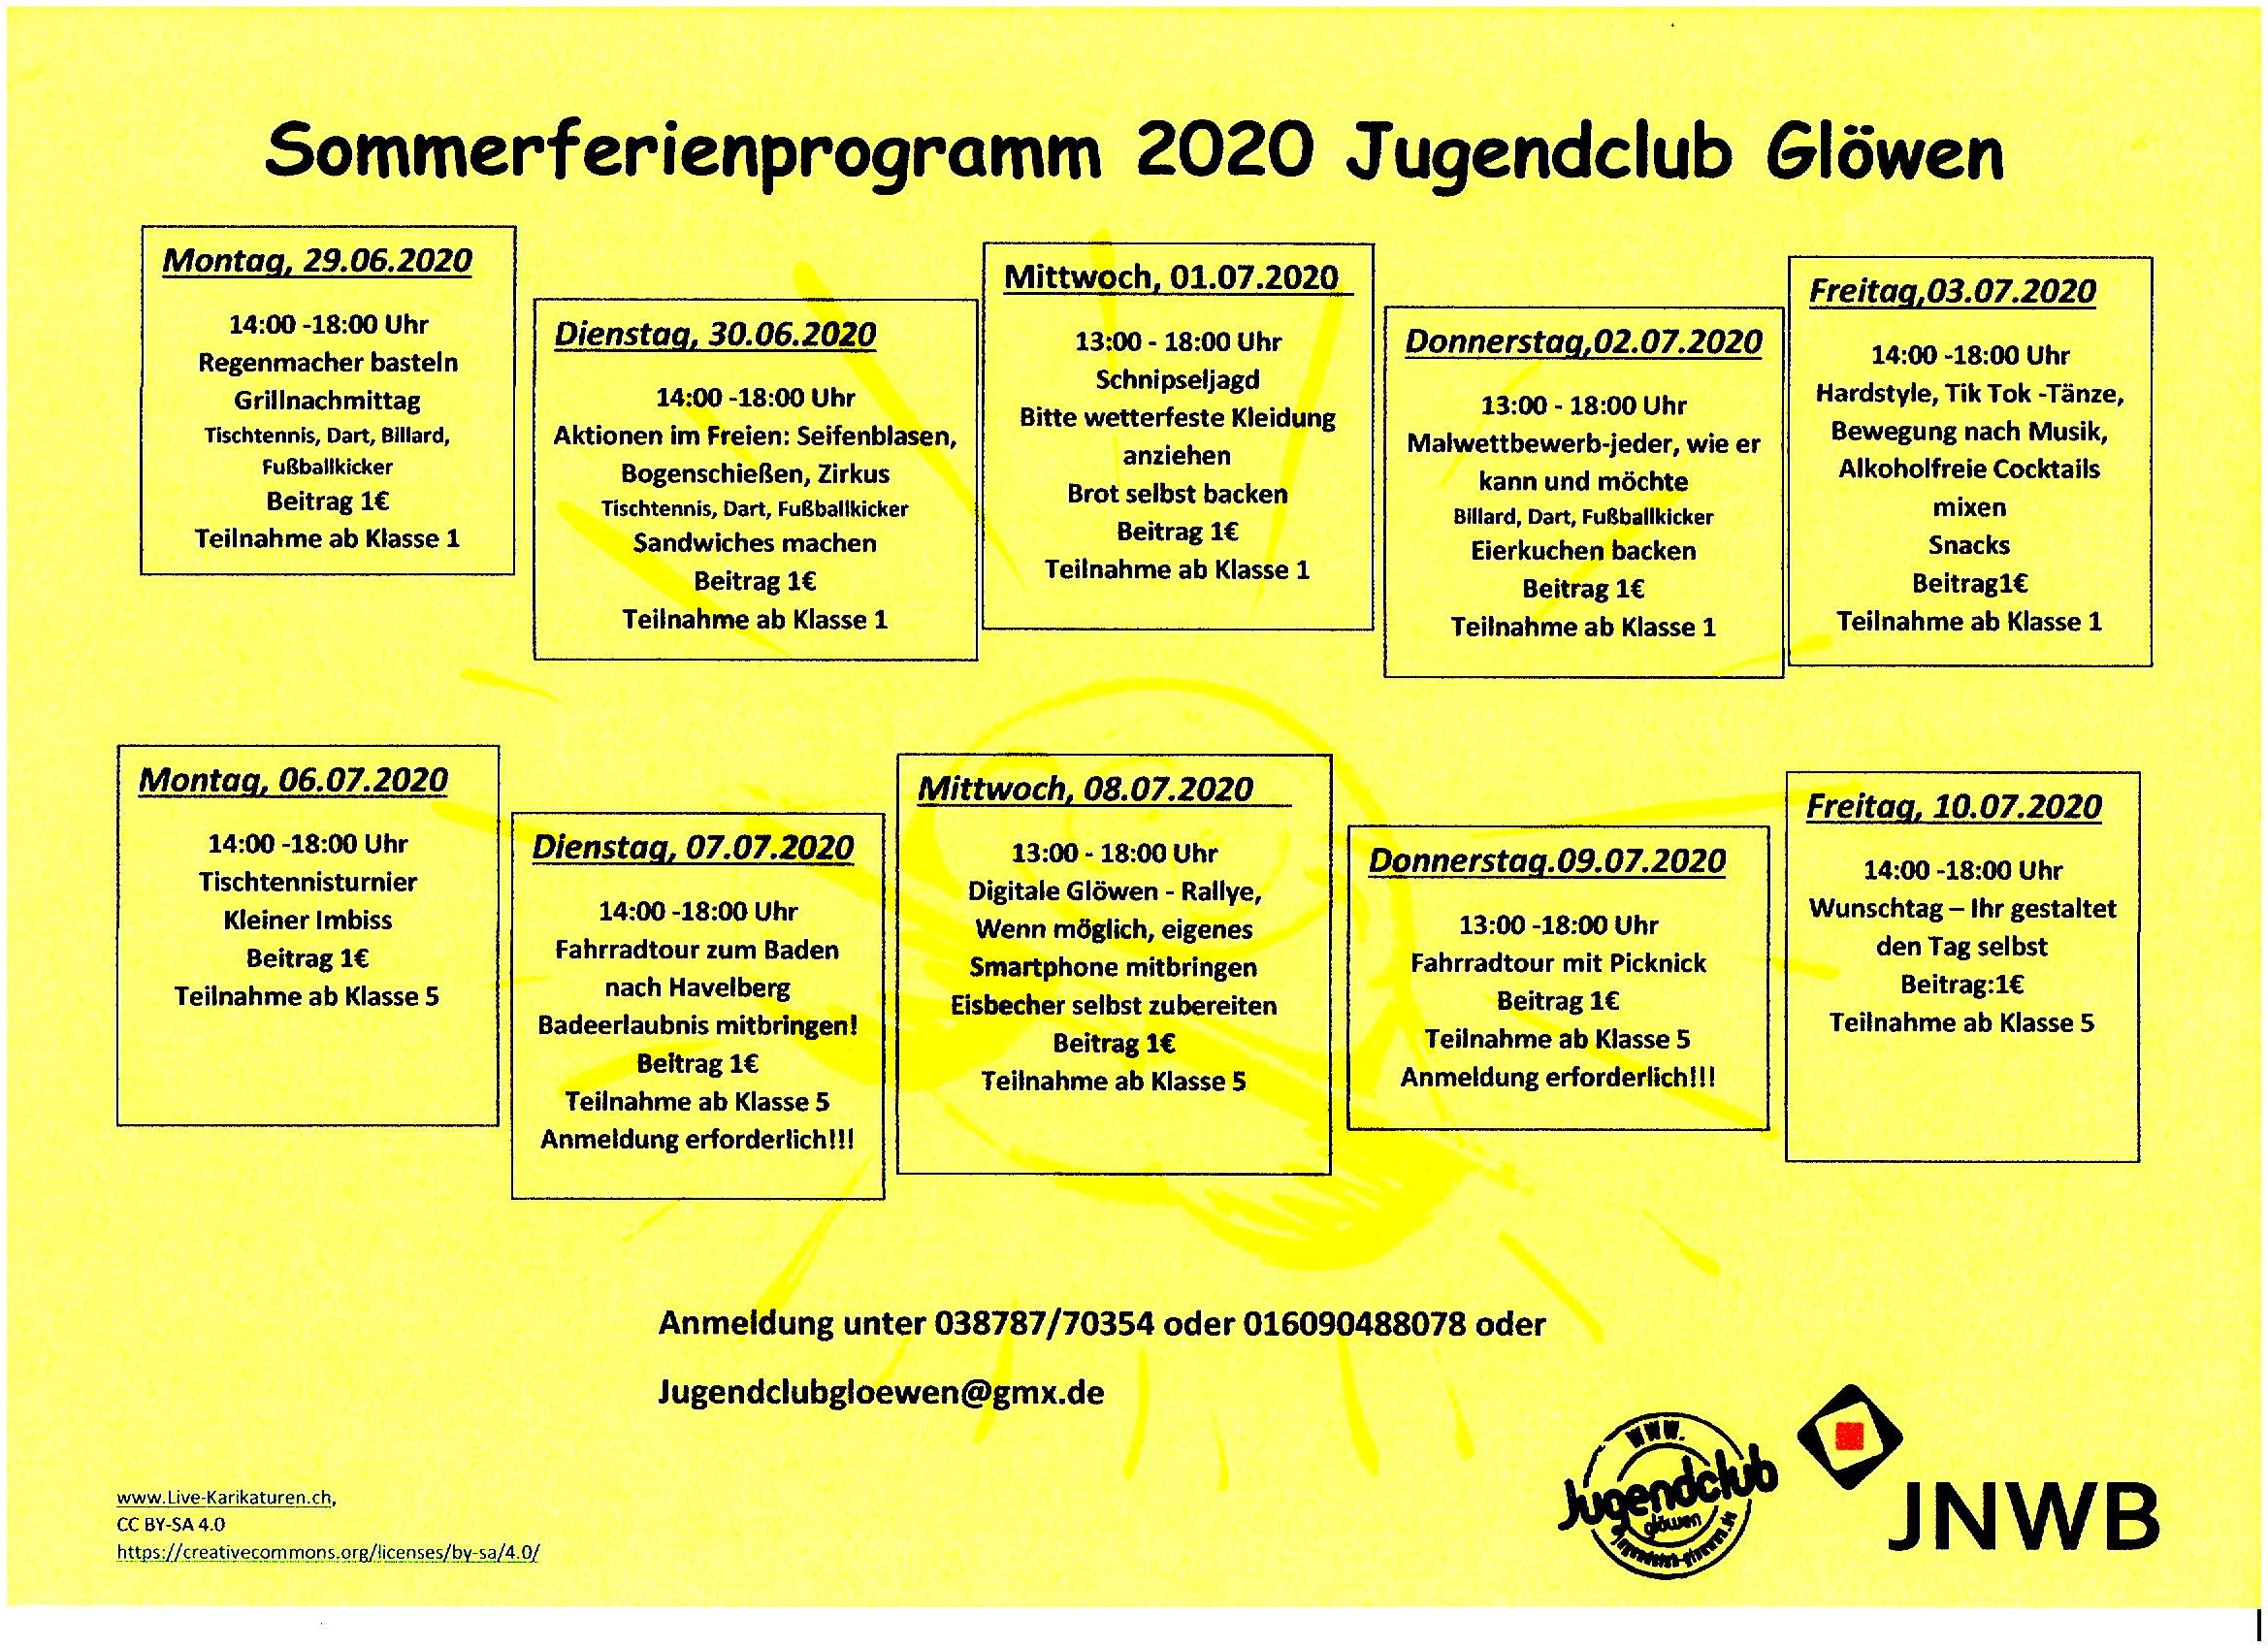 ...Unser Ferienprogramm Sommer 2020...